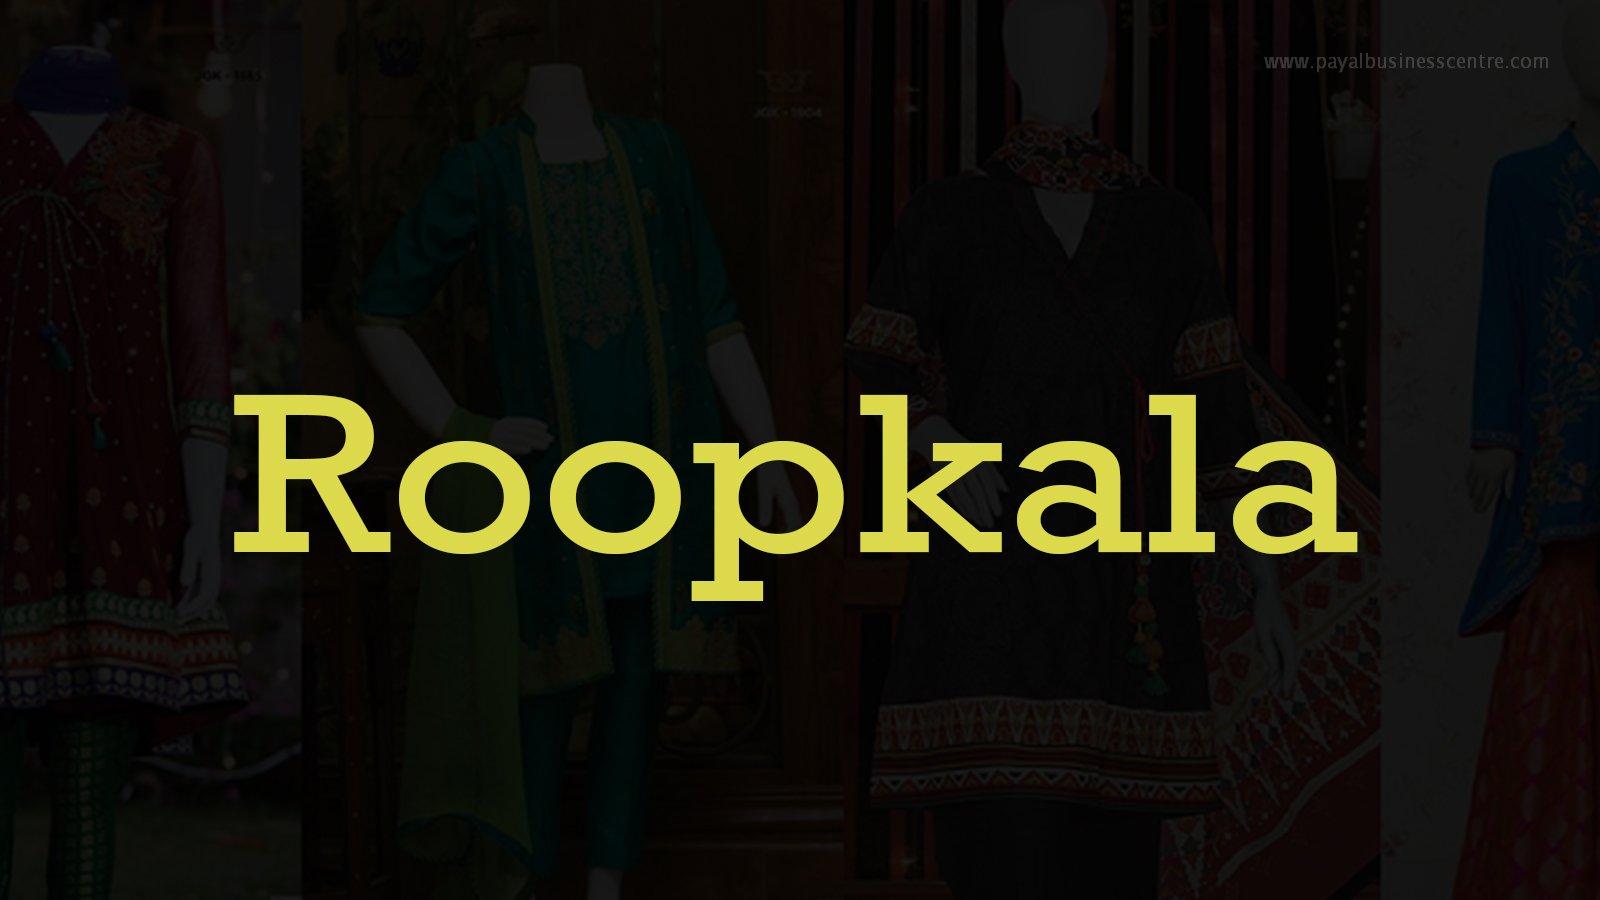 Roopkala